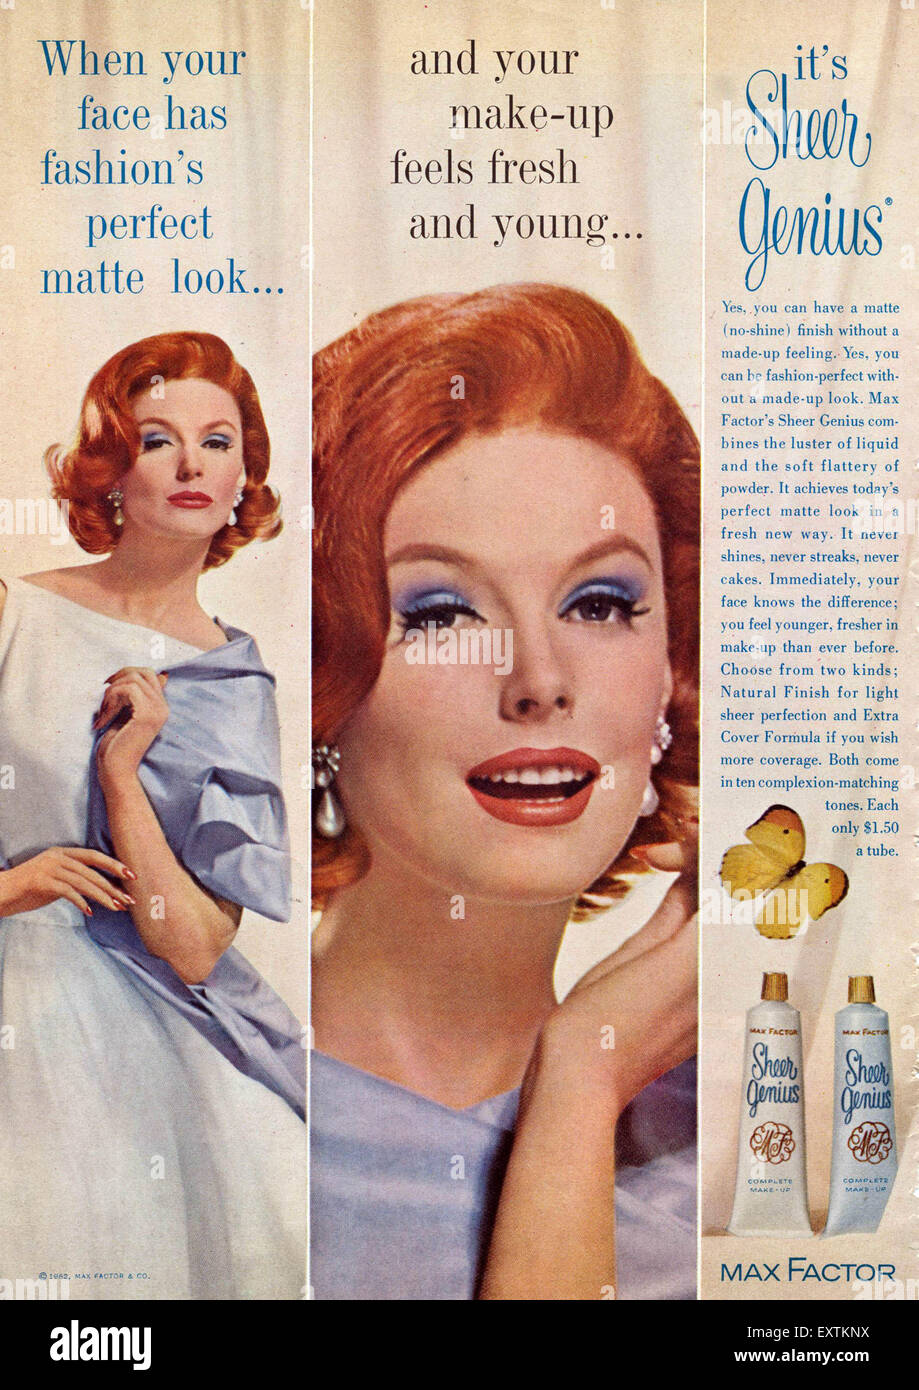 1960s USA Max Factor Magazine Advert Stock Photo, Royalty Free ...